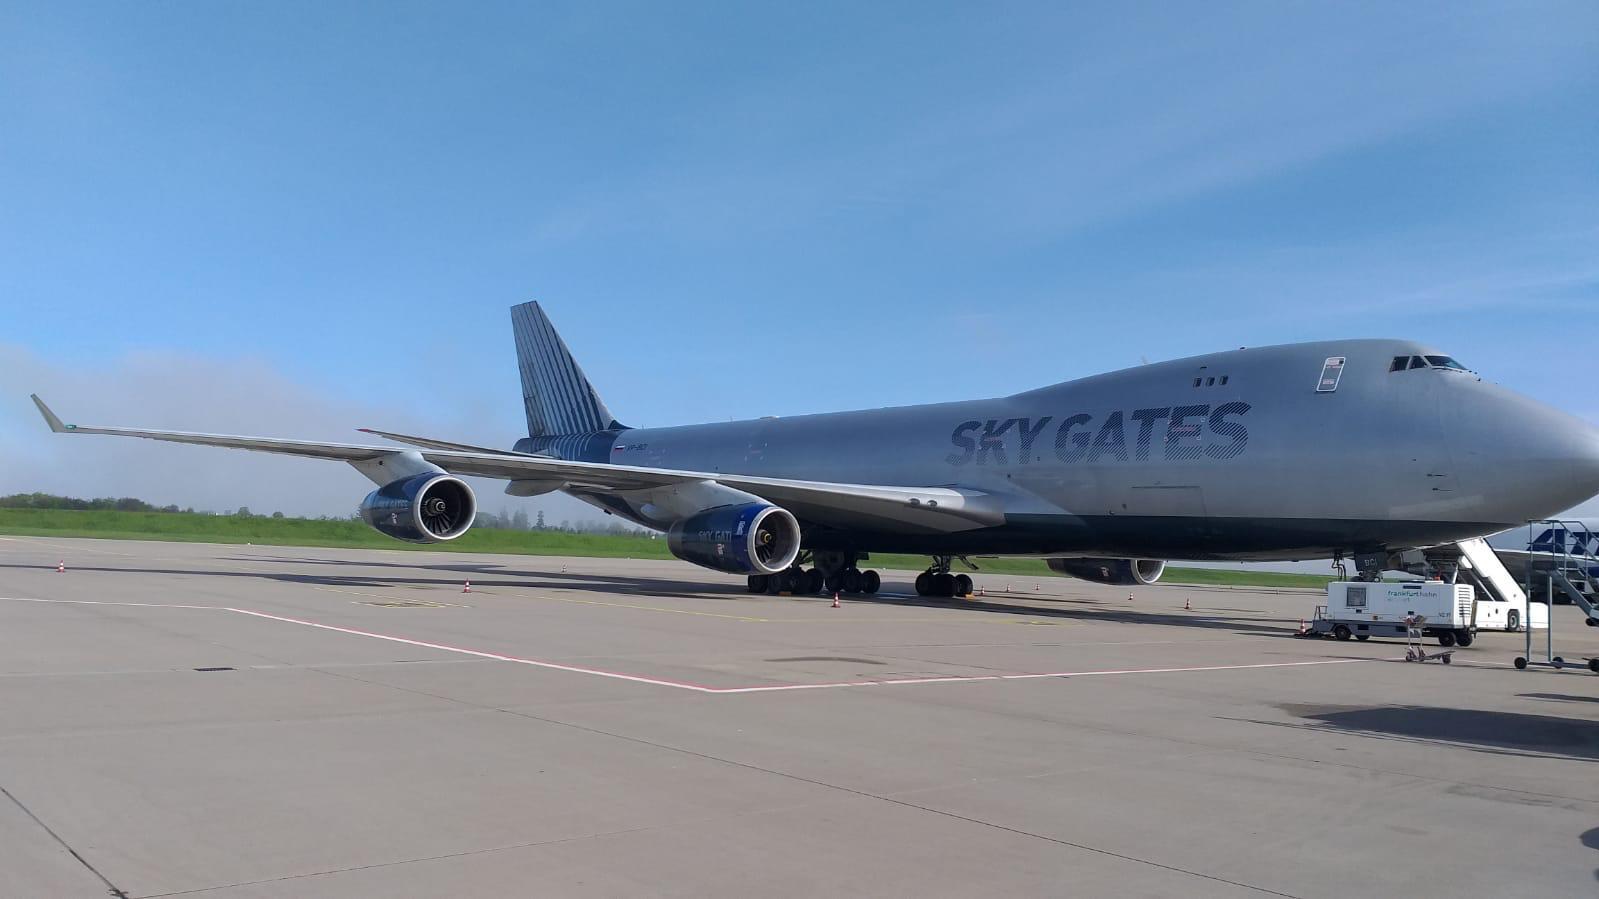 Самолёт авиакомпании Sky Gates - партнёра Александра Евгеньевича Удодова